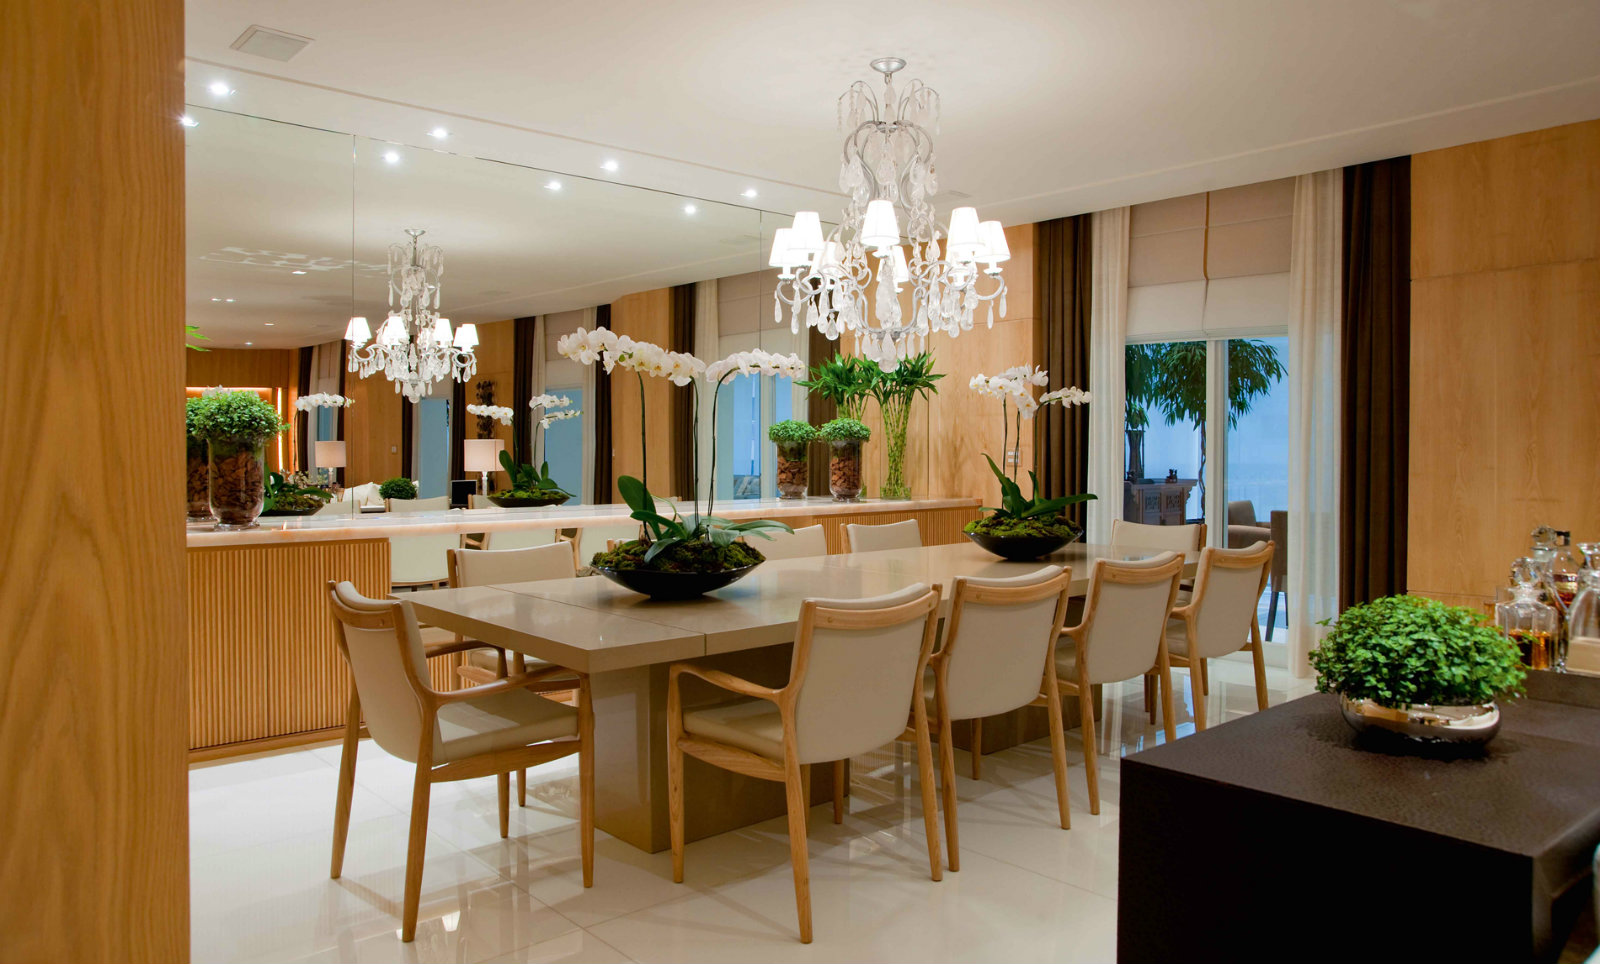 Como Decorar Buffet Sala De Jantar ~ Dicas para decorar a Sala de Jantar